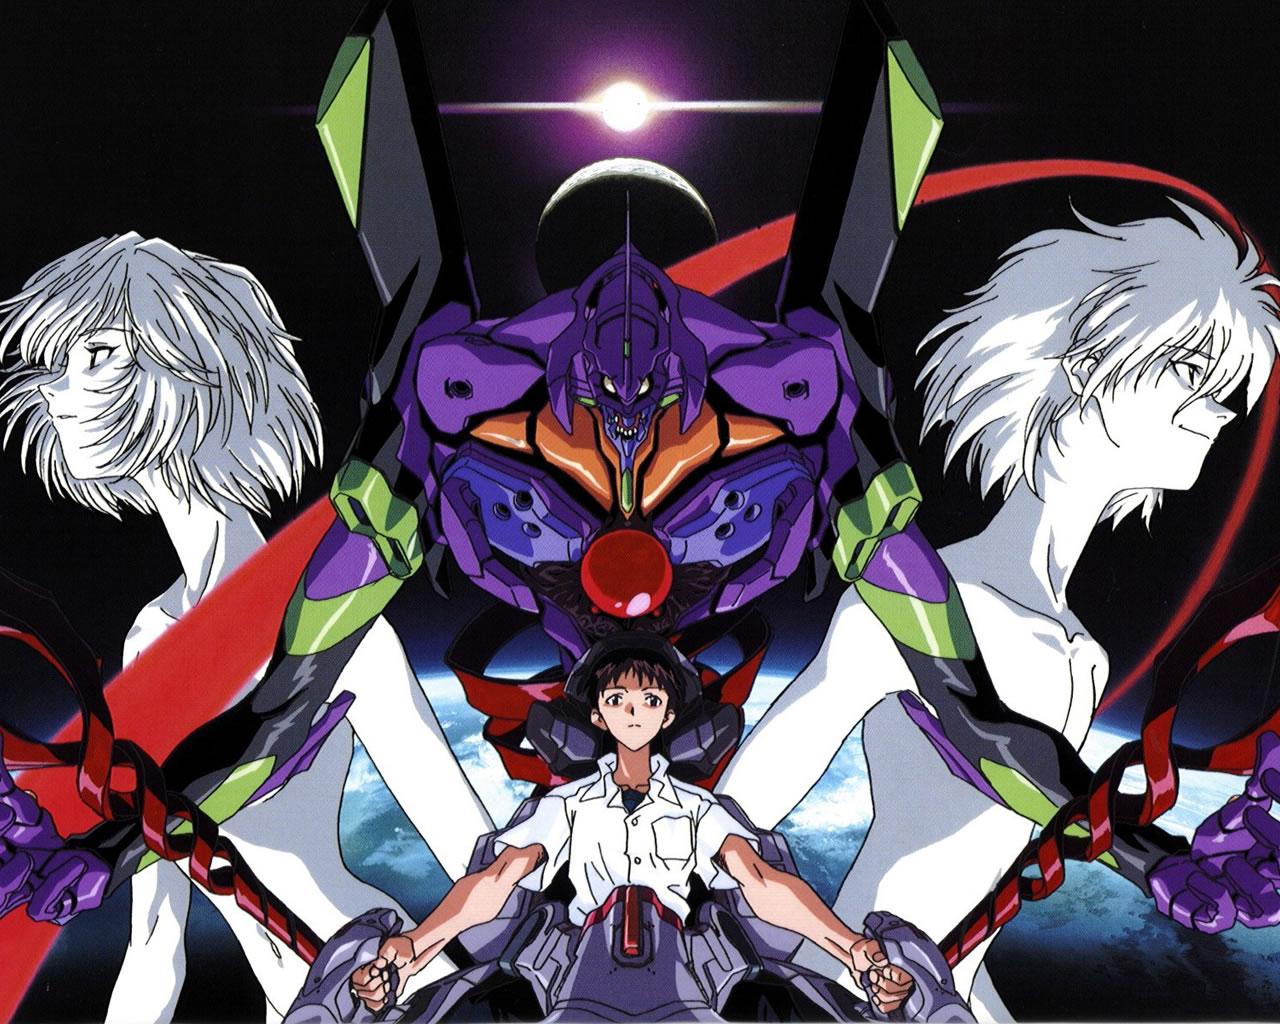 Eva Unit 01 And Pilots Neon Genesis Evangelion Gainax 1280x1024 Wallpaper Teahub Io